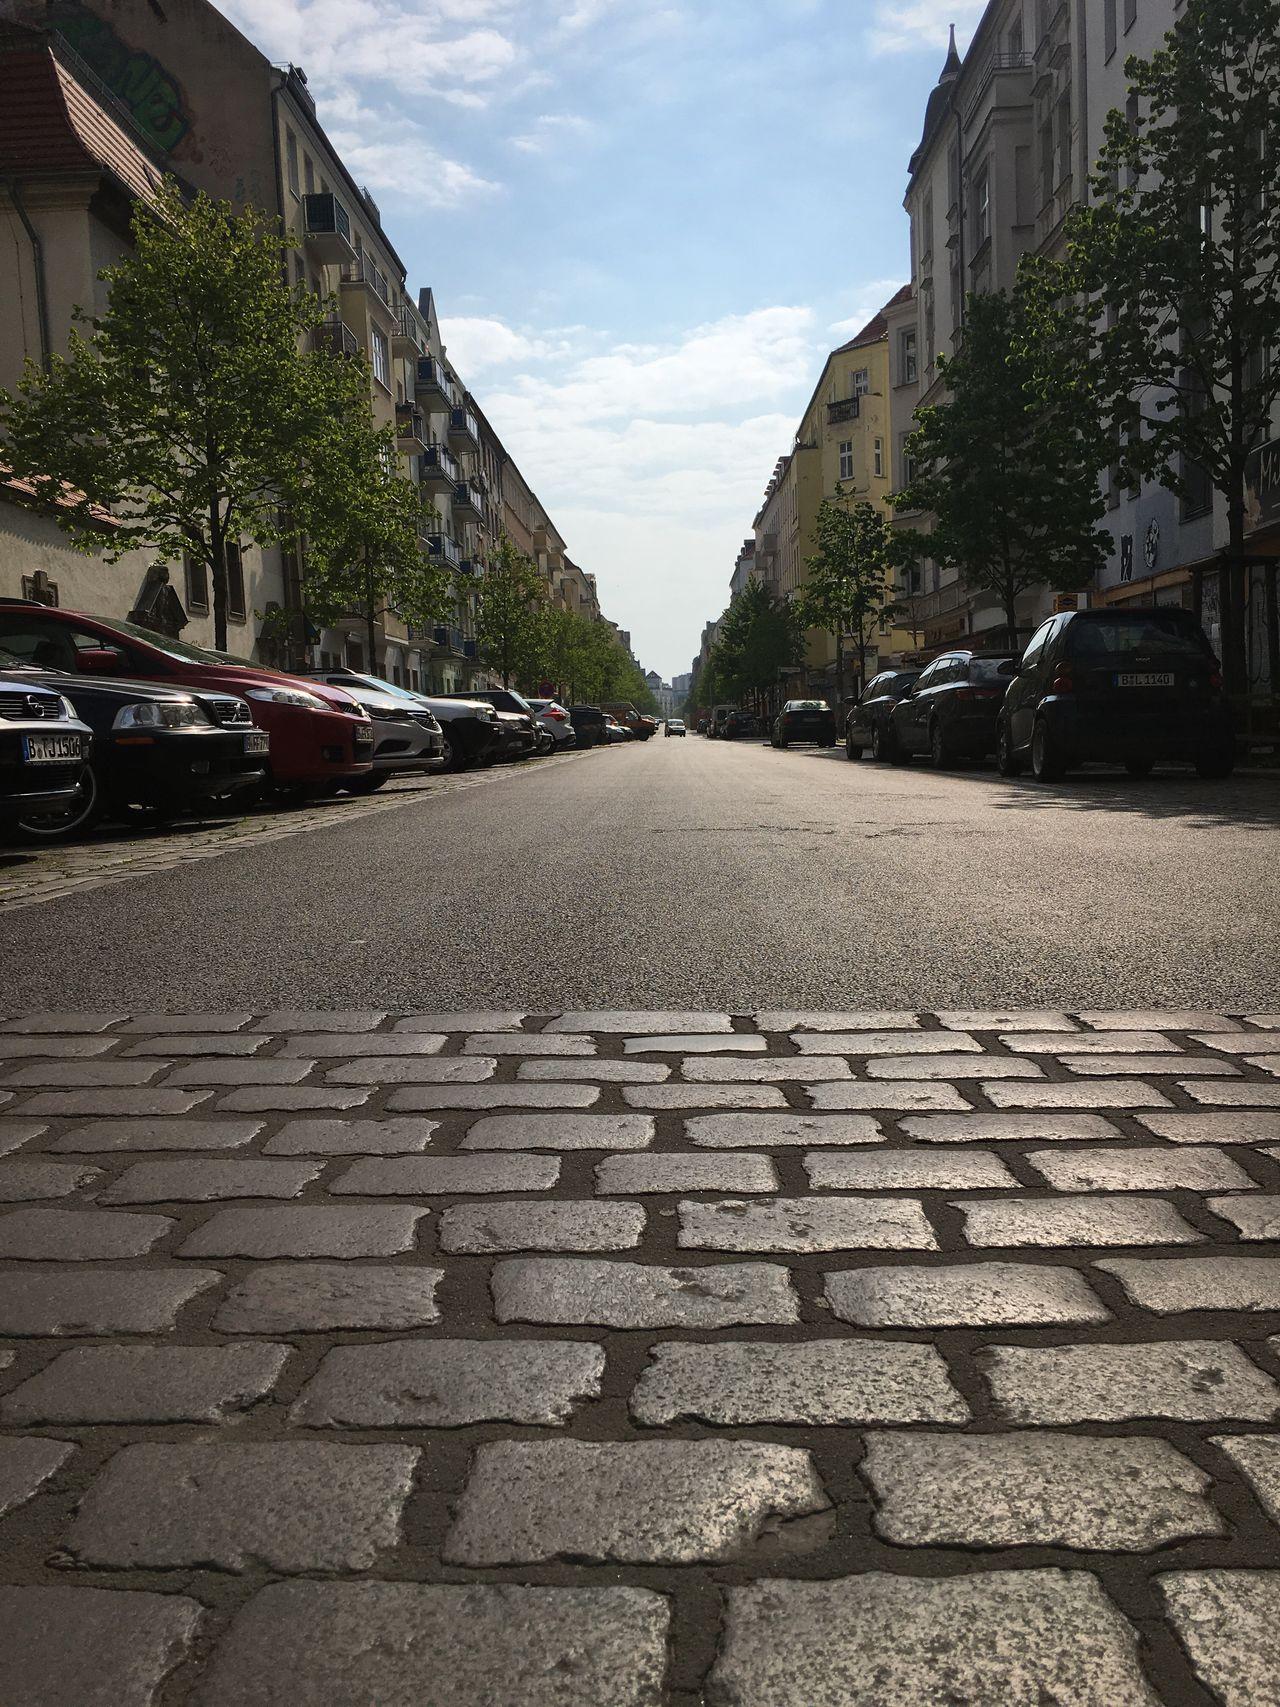 Guten Morgen Friedrichshain 1. Mai Zentralperspektive Road Sunny Morning No Riot Empty No People